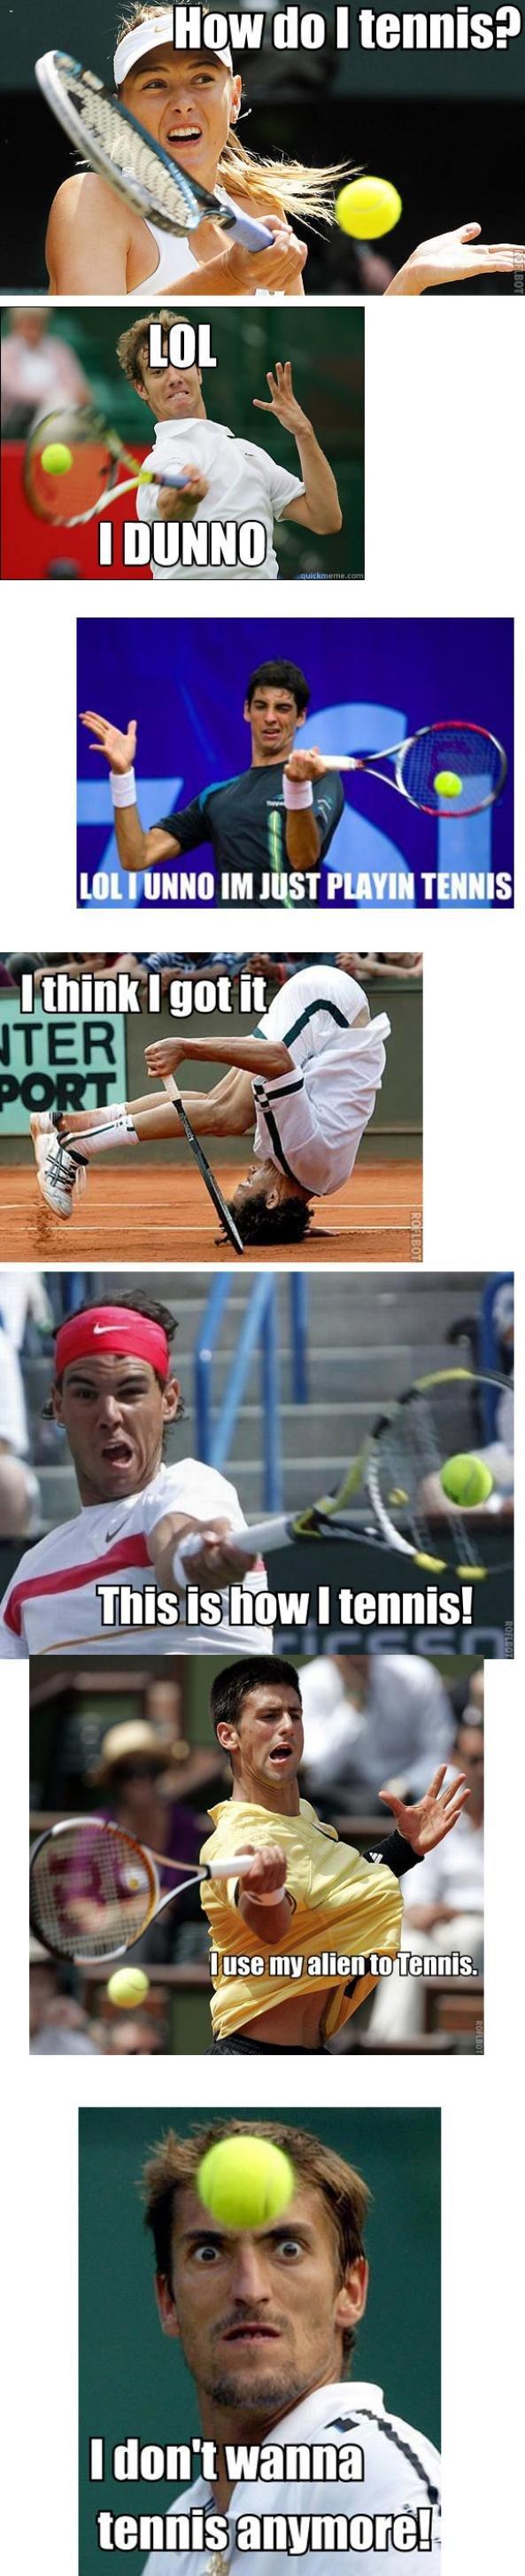 "Tennis is hard. . i amar Ill I mum um my mun TENNIS Ease my alien"" to . tennis ' III? I ill"